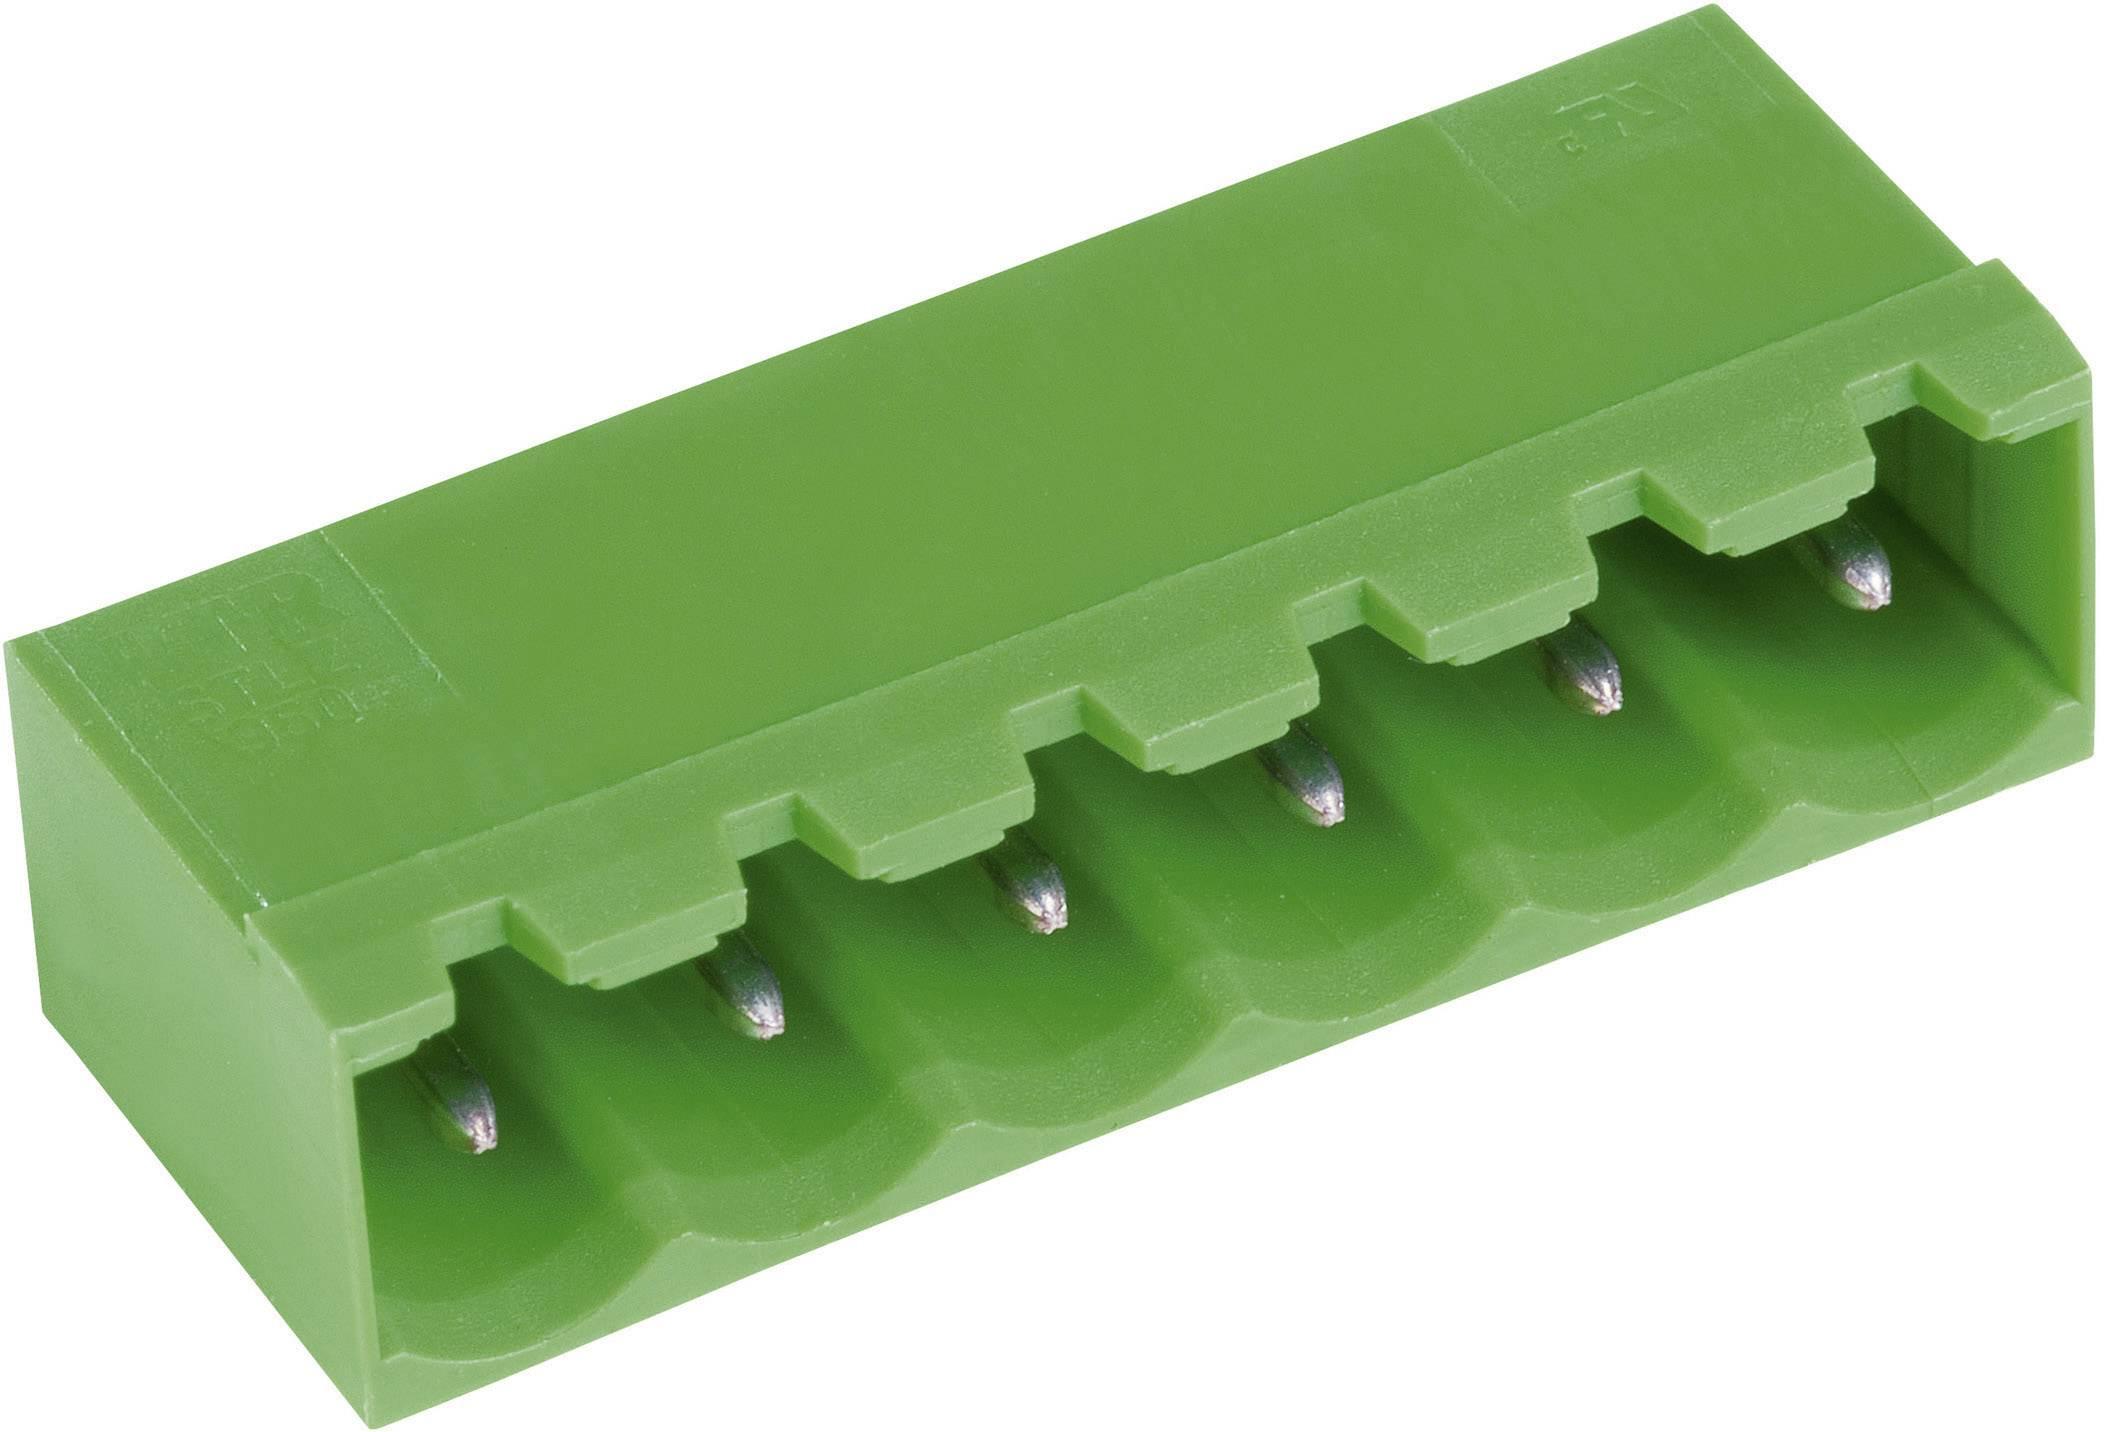 Konektor do DPS PTR STLZ950/10G-5.08-H 50950105021D, 52.00 mm, pólů 10, rozteč 5.08 mm, 1 ks